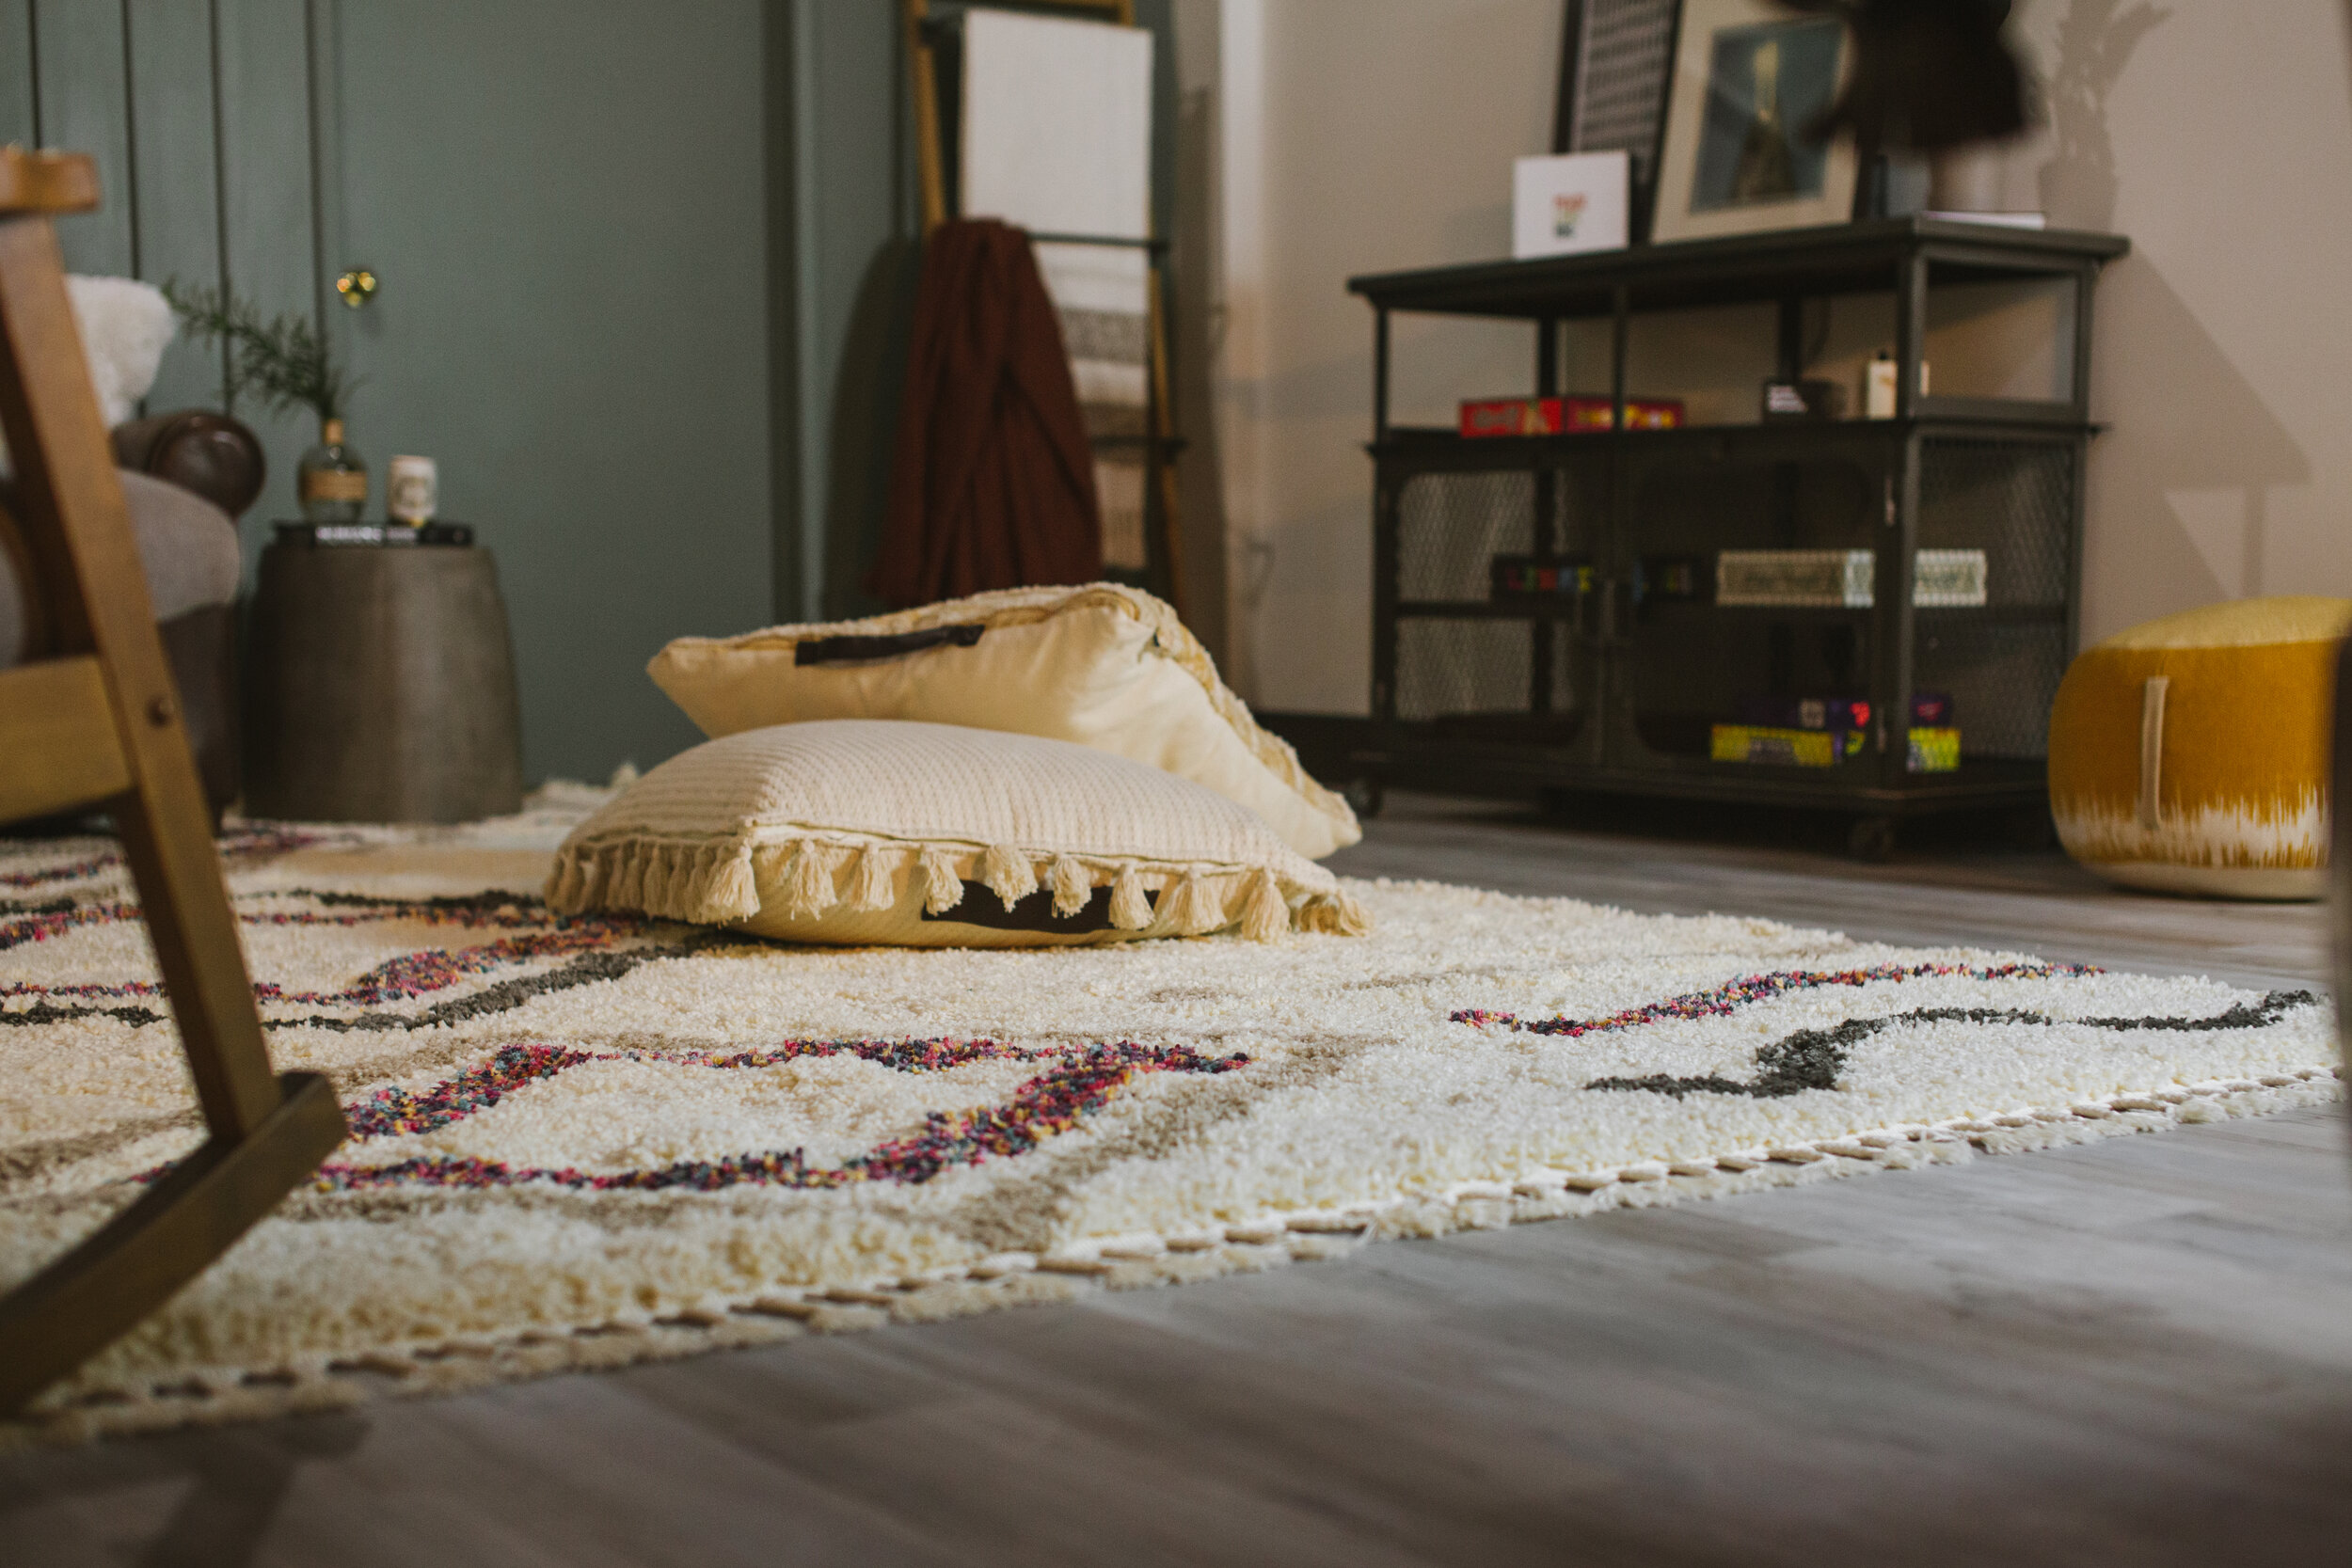 I love the pretty fringe on the rug.